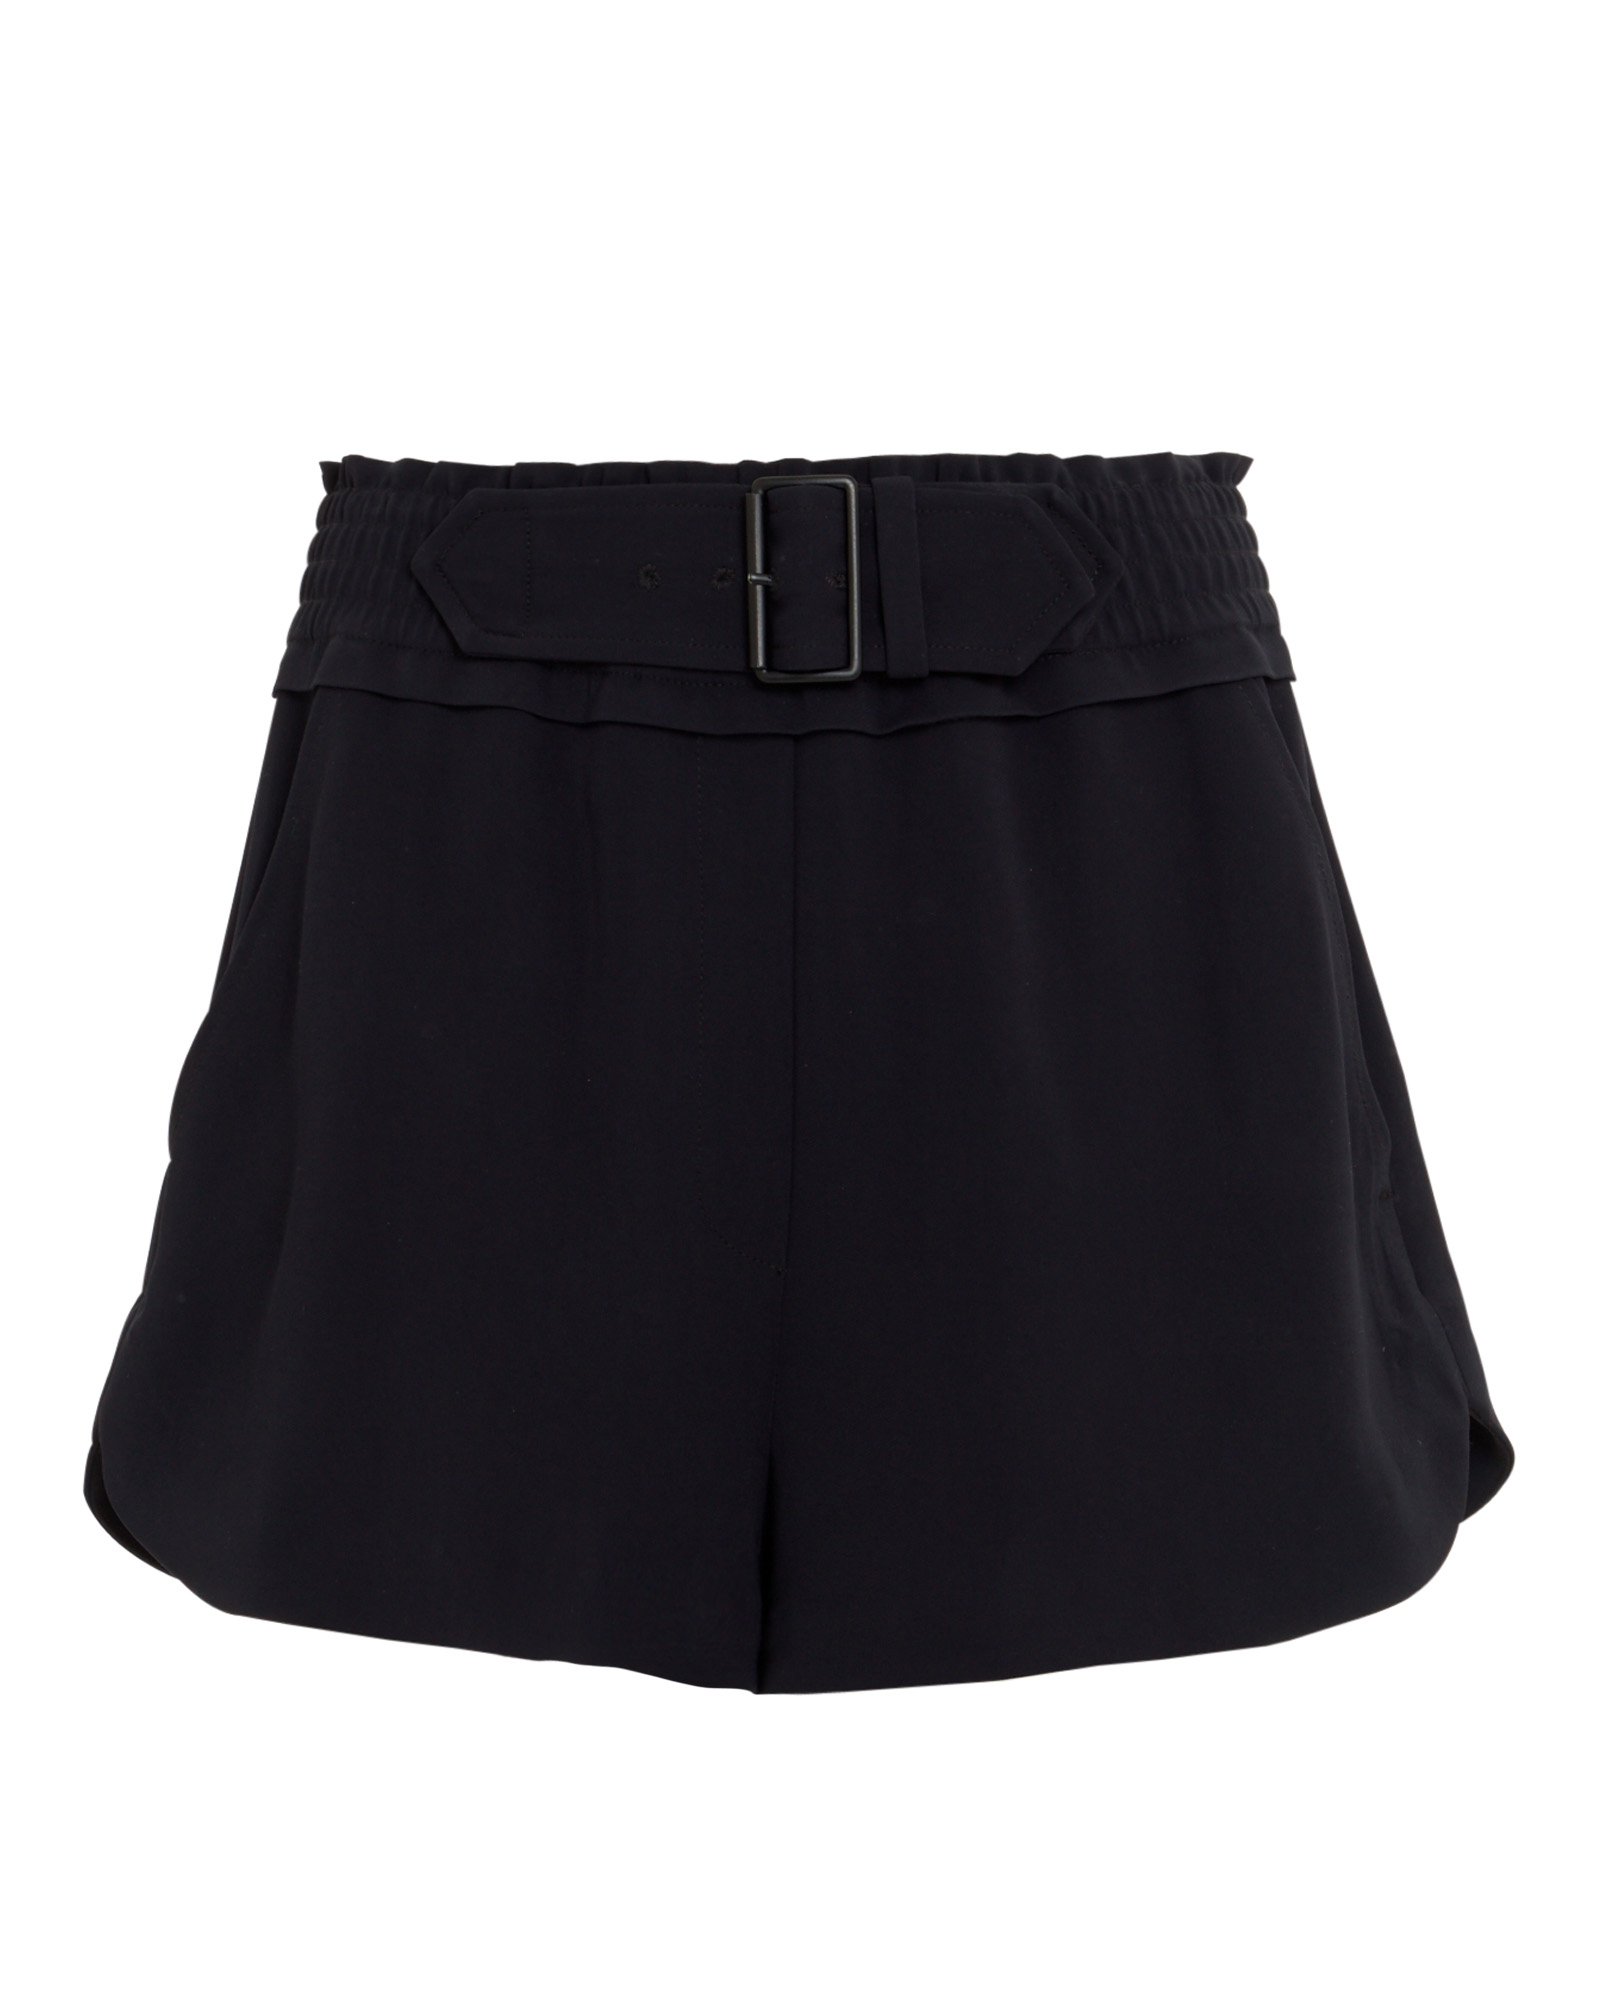 A.l.c Shorts A.L.C. AUBURN BELTED SHORTS  BLACK 6